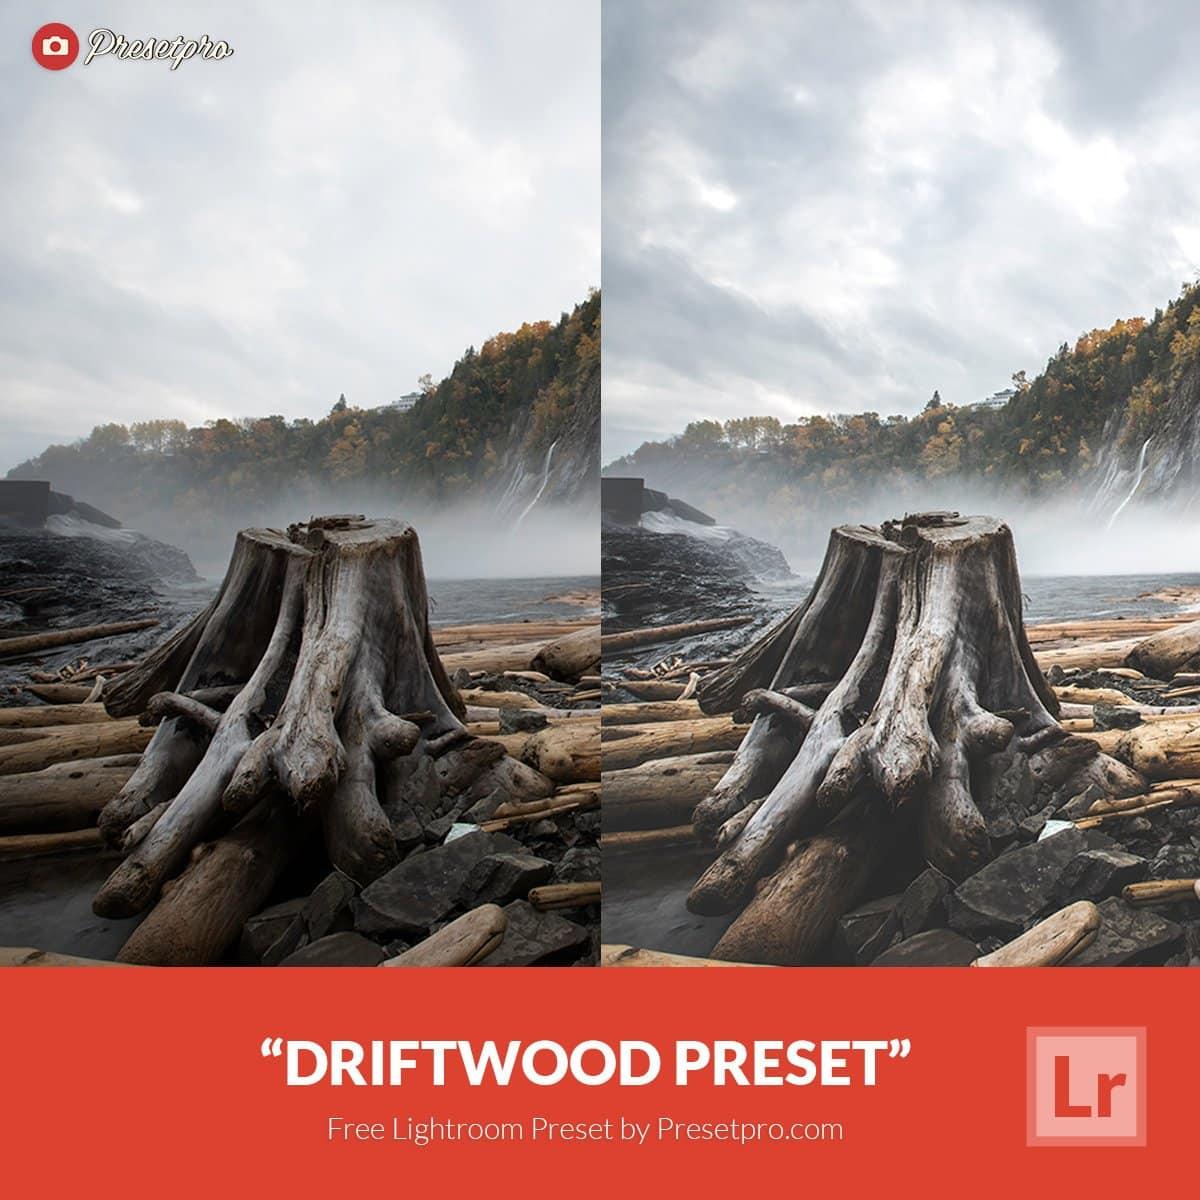 Free-Lightroom-Preset-Driftwood-Presetpro.com